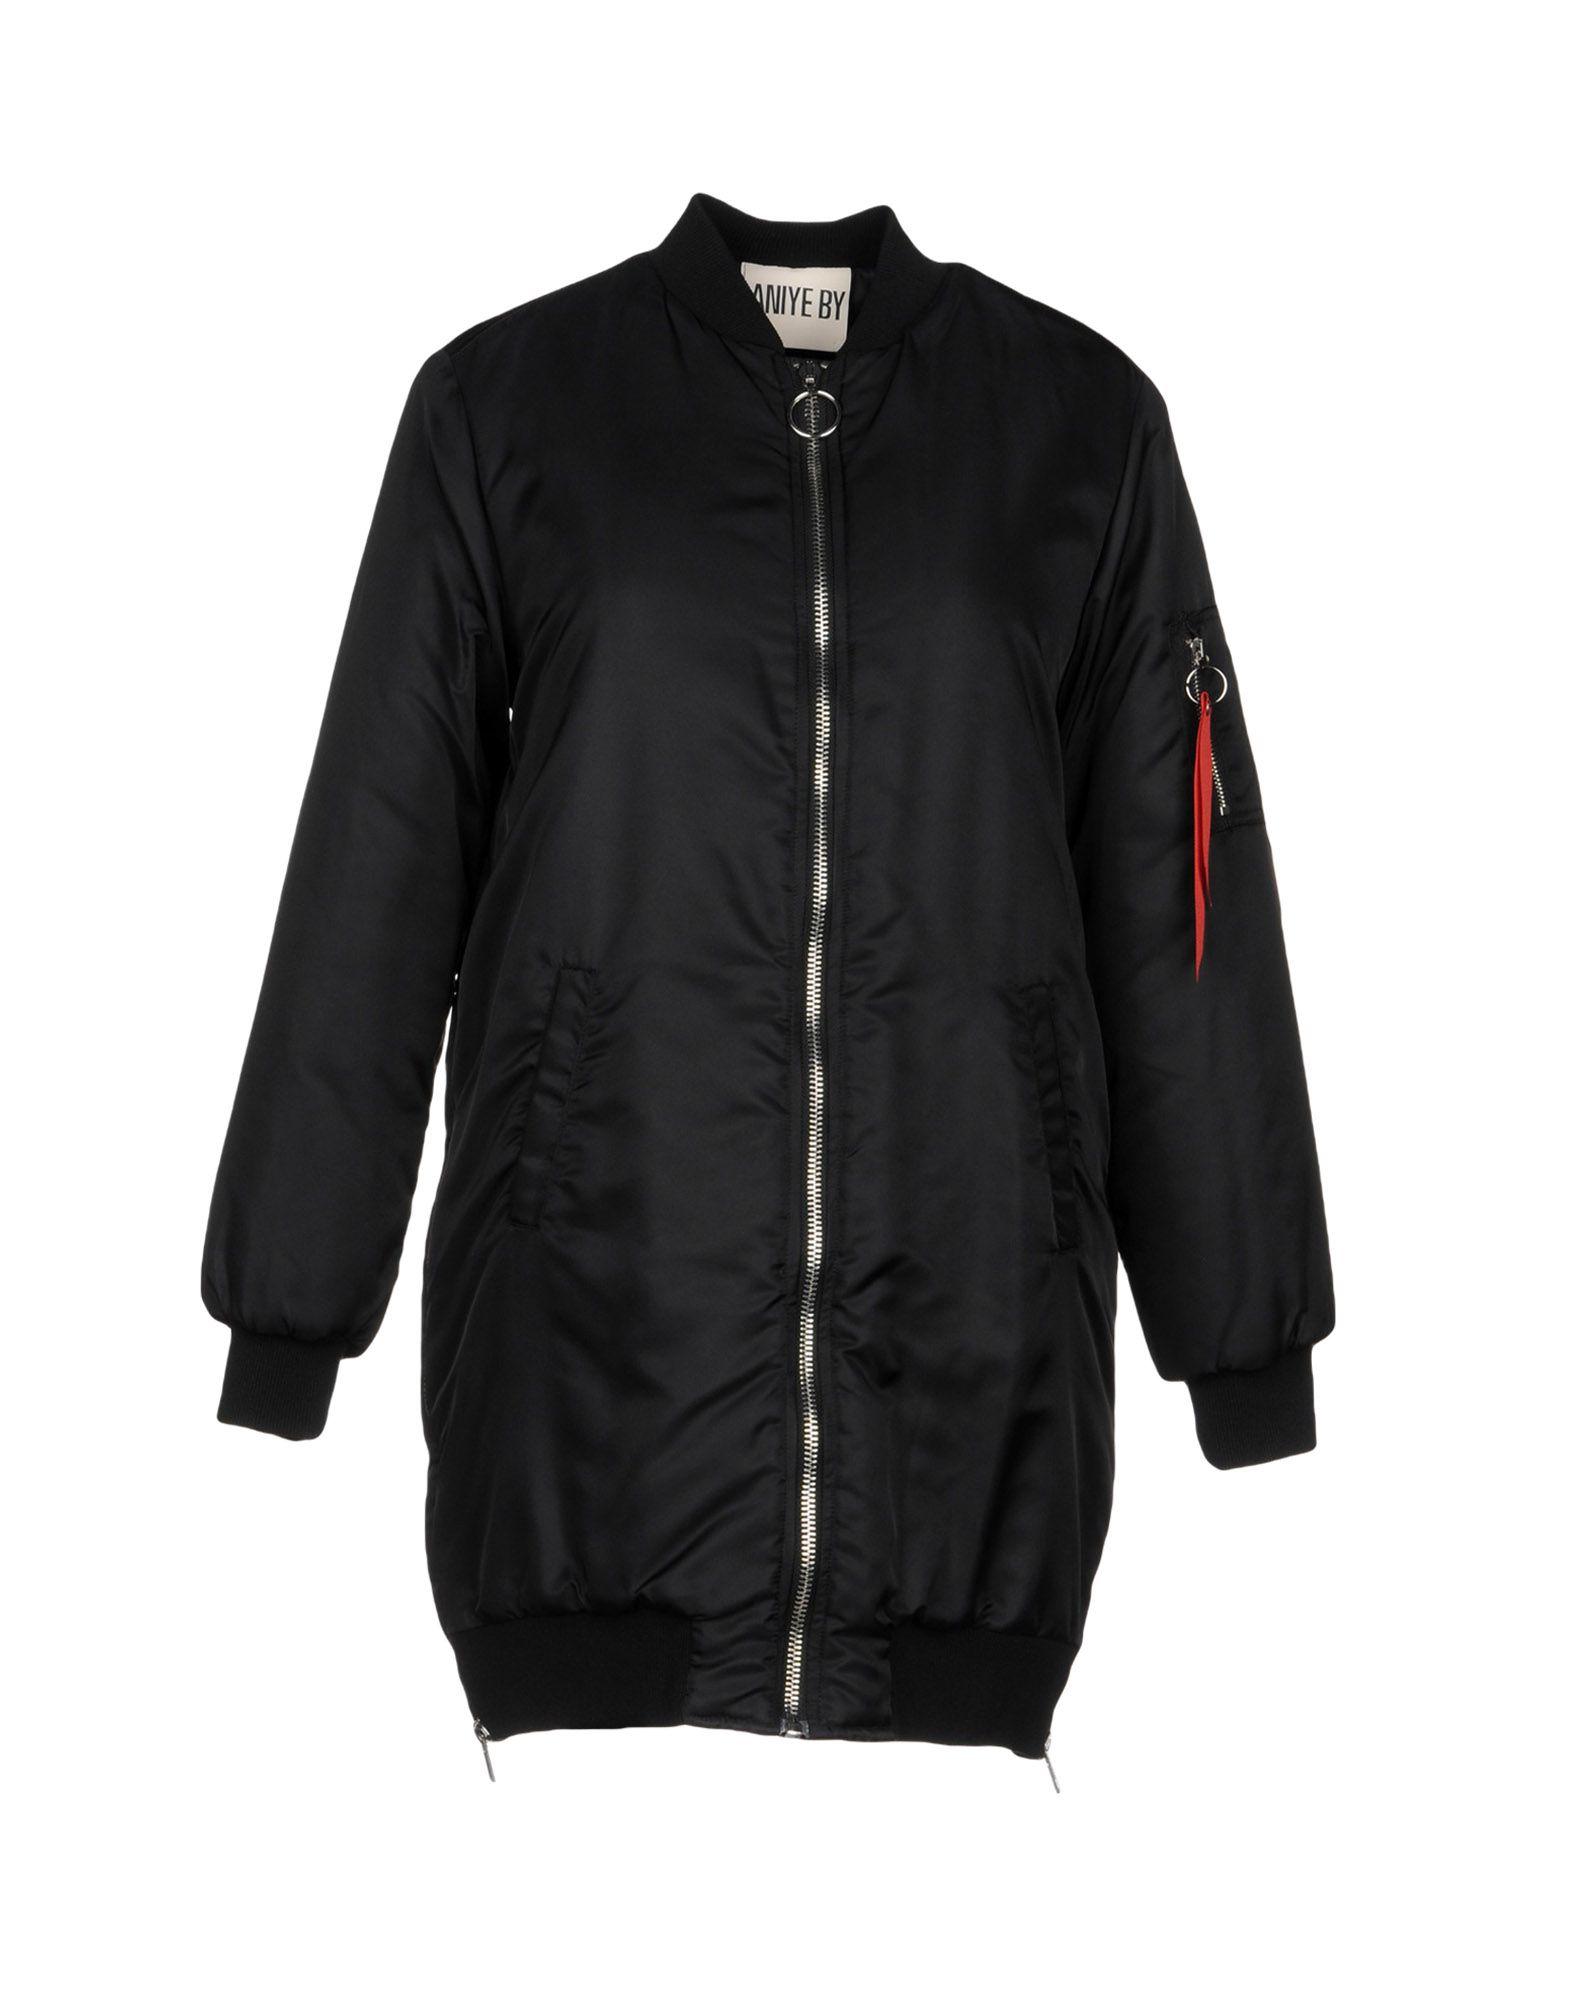 ANIYE BY Куртка цена